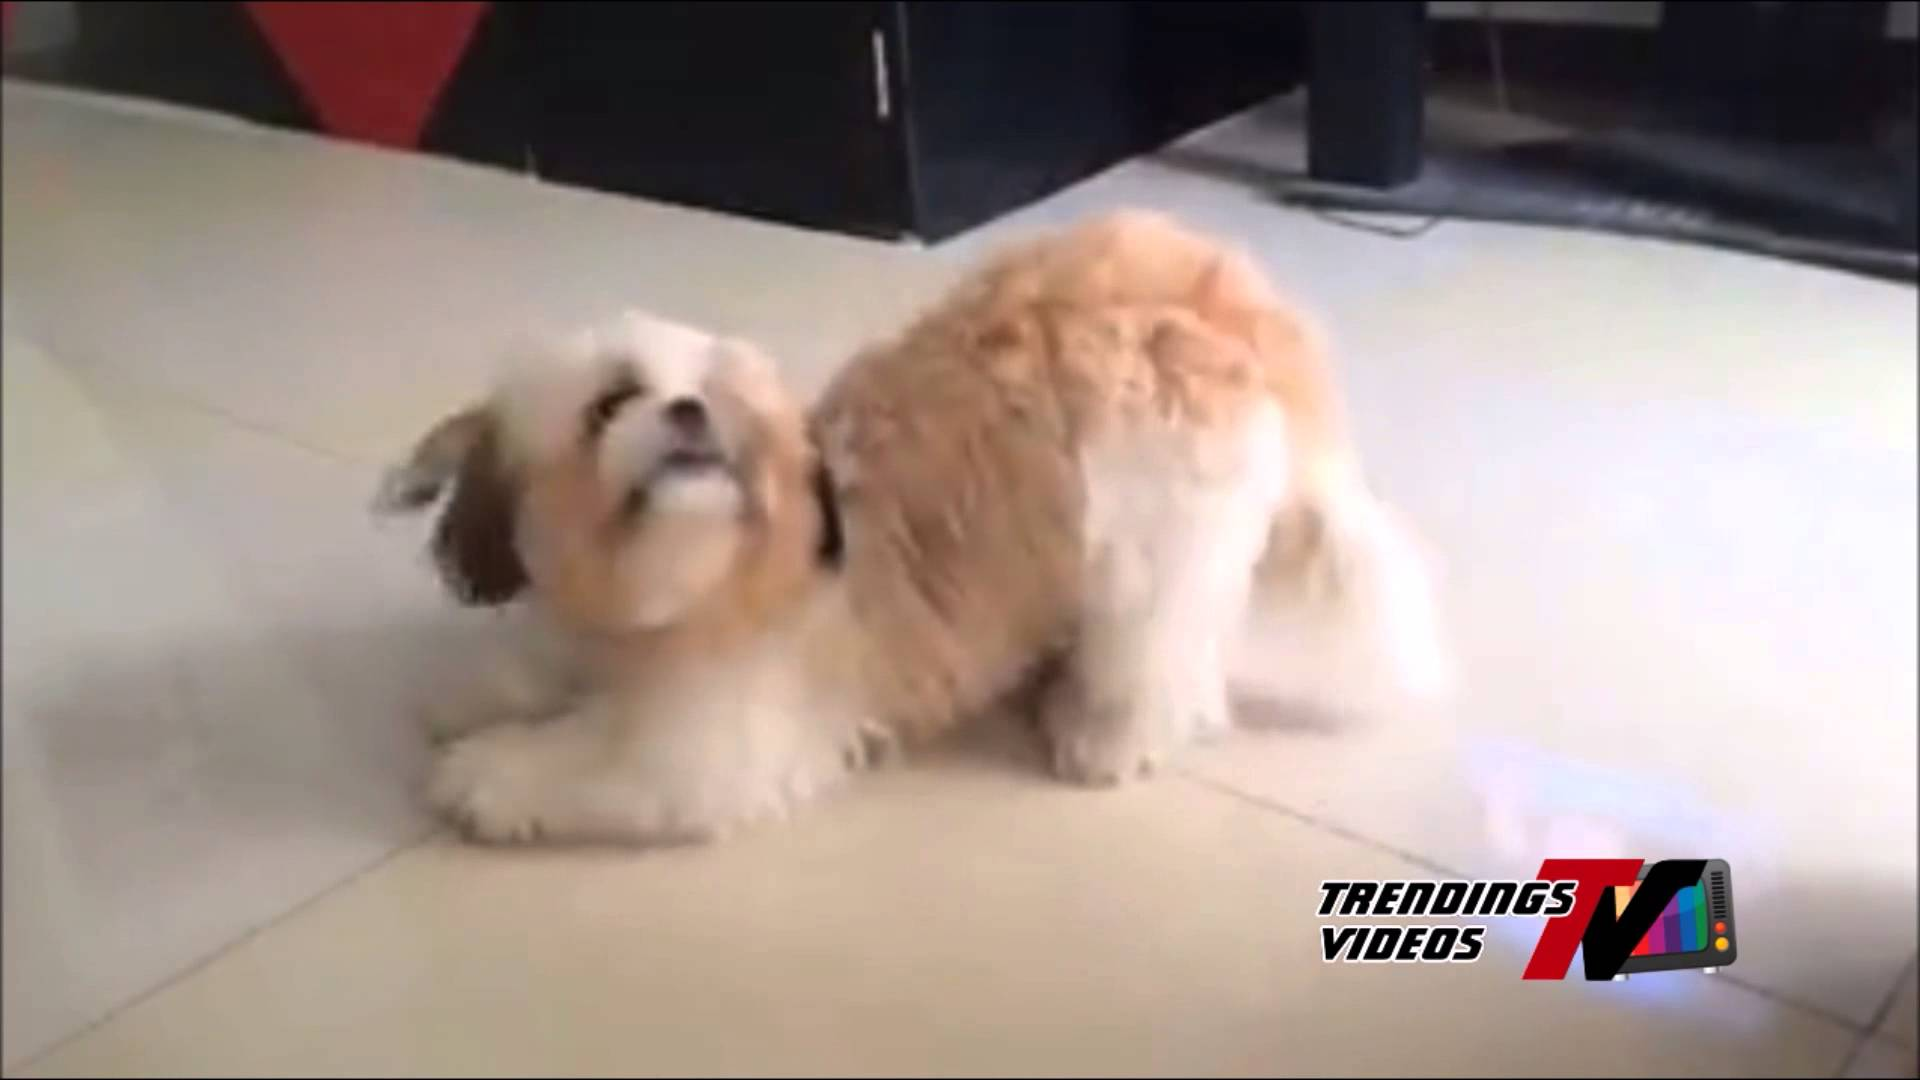 video of funny Shih Tzu